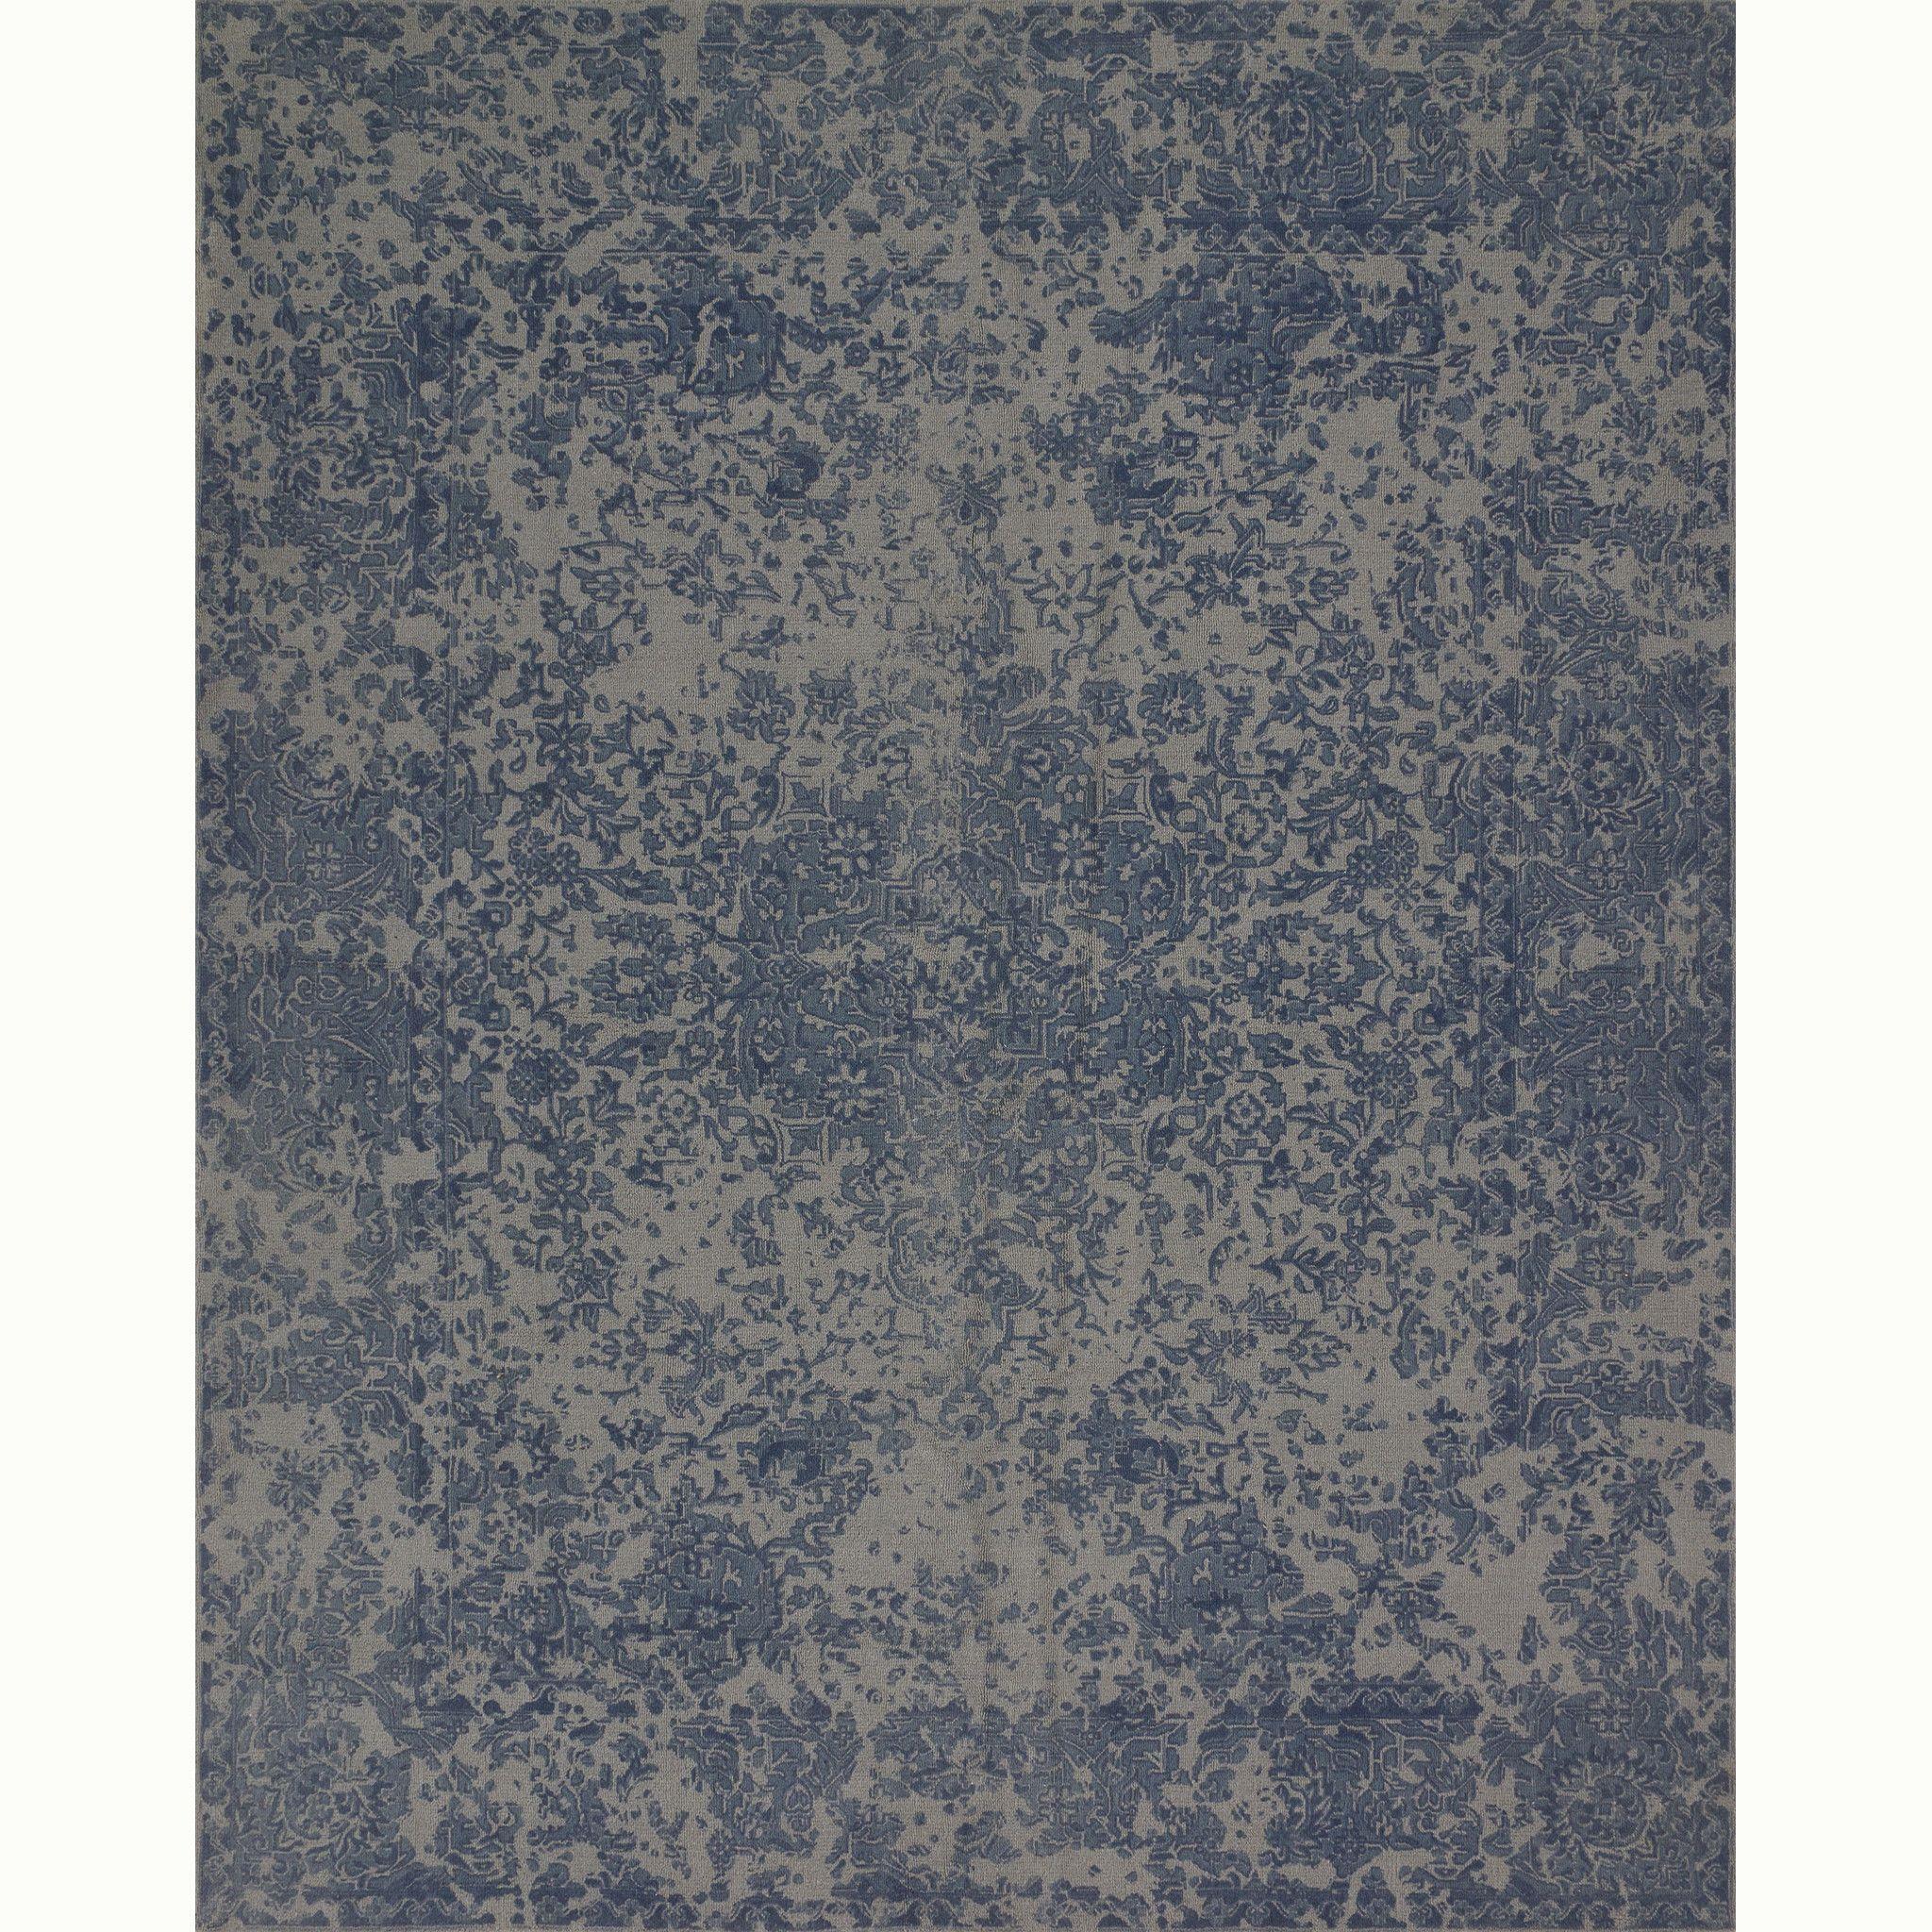 shop magnolia zoom home blue pier rose in rugs imports area rug ella